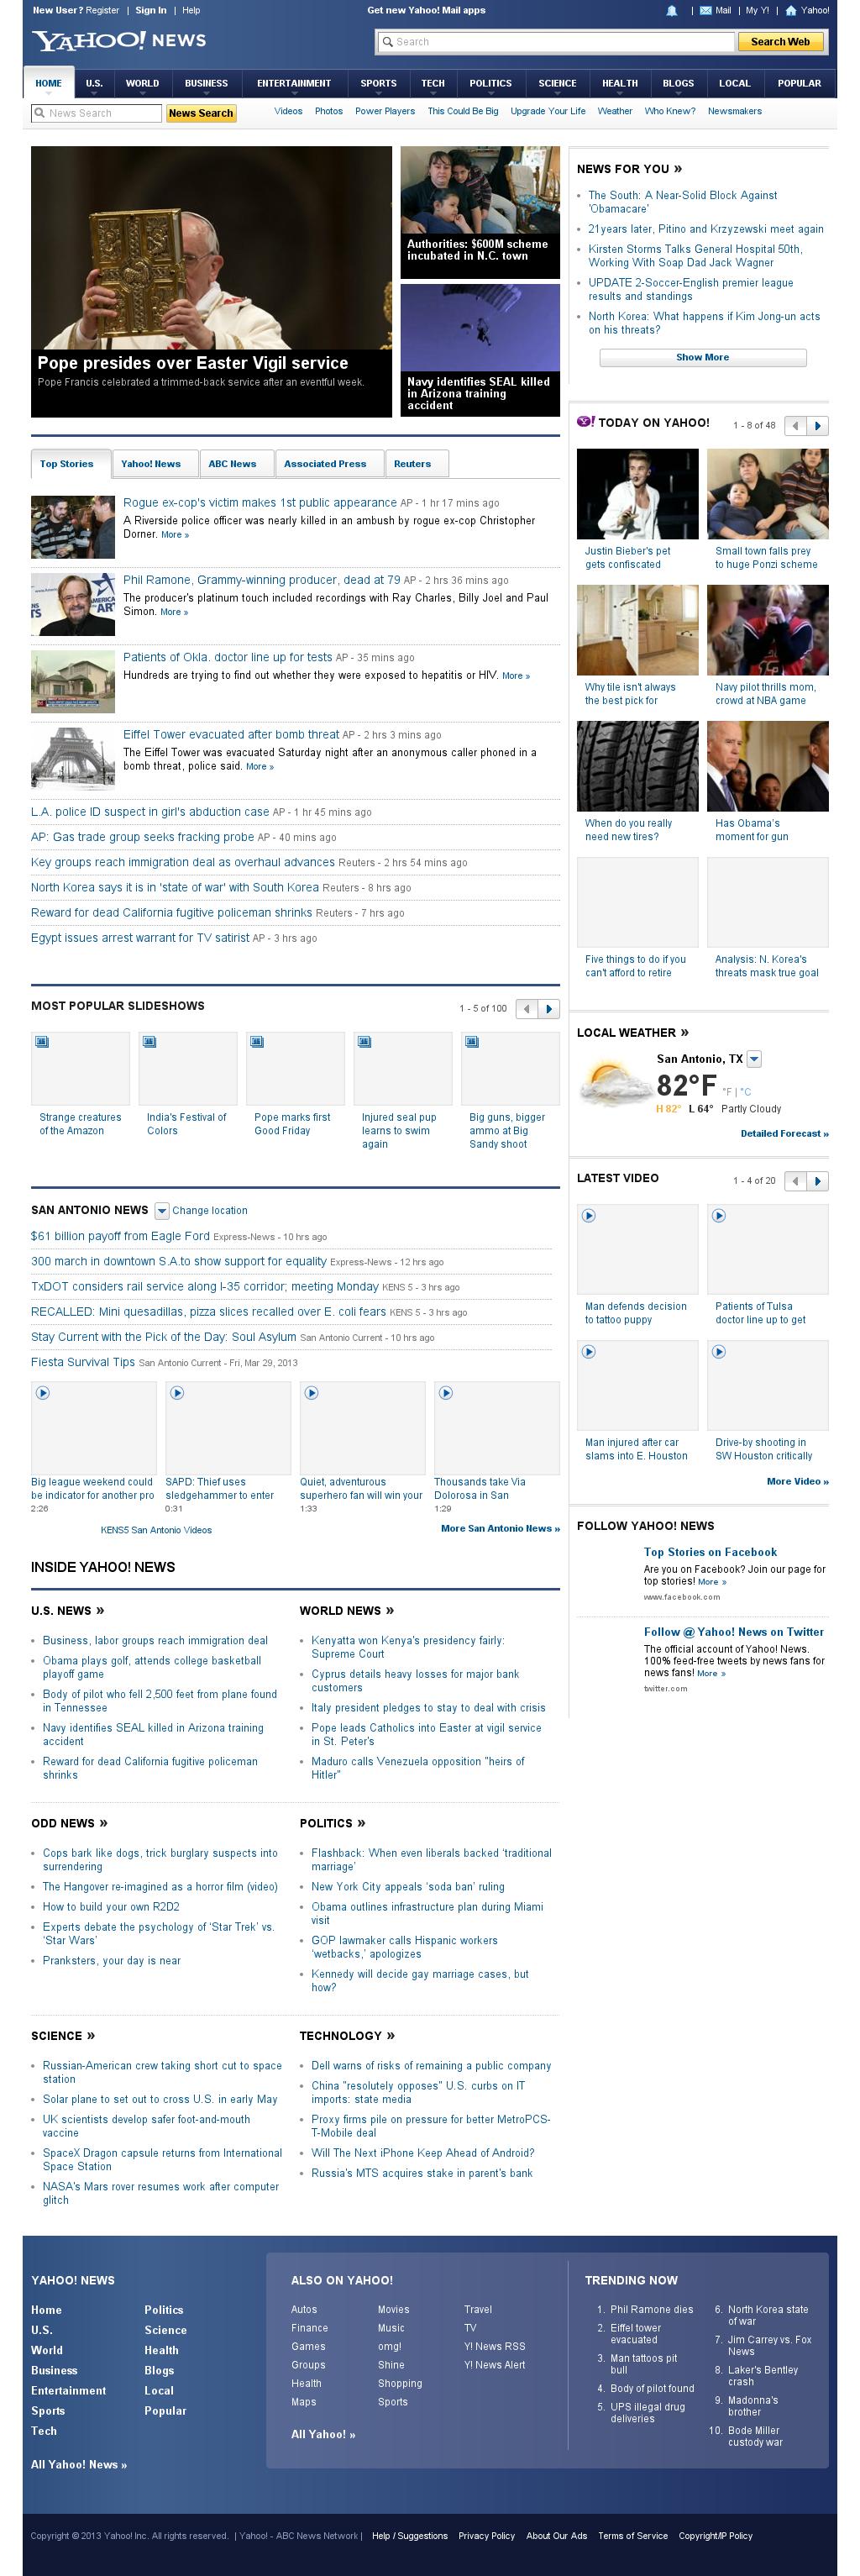 Yahoo! News at Sunday March 31, 2013, 12:26 a.m. UTC